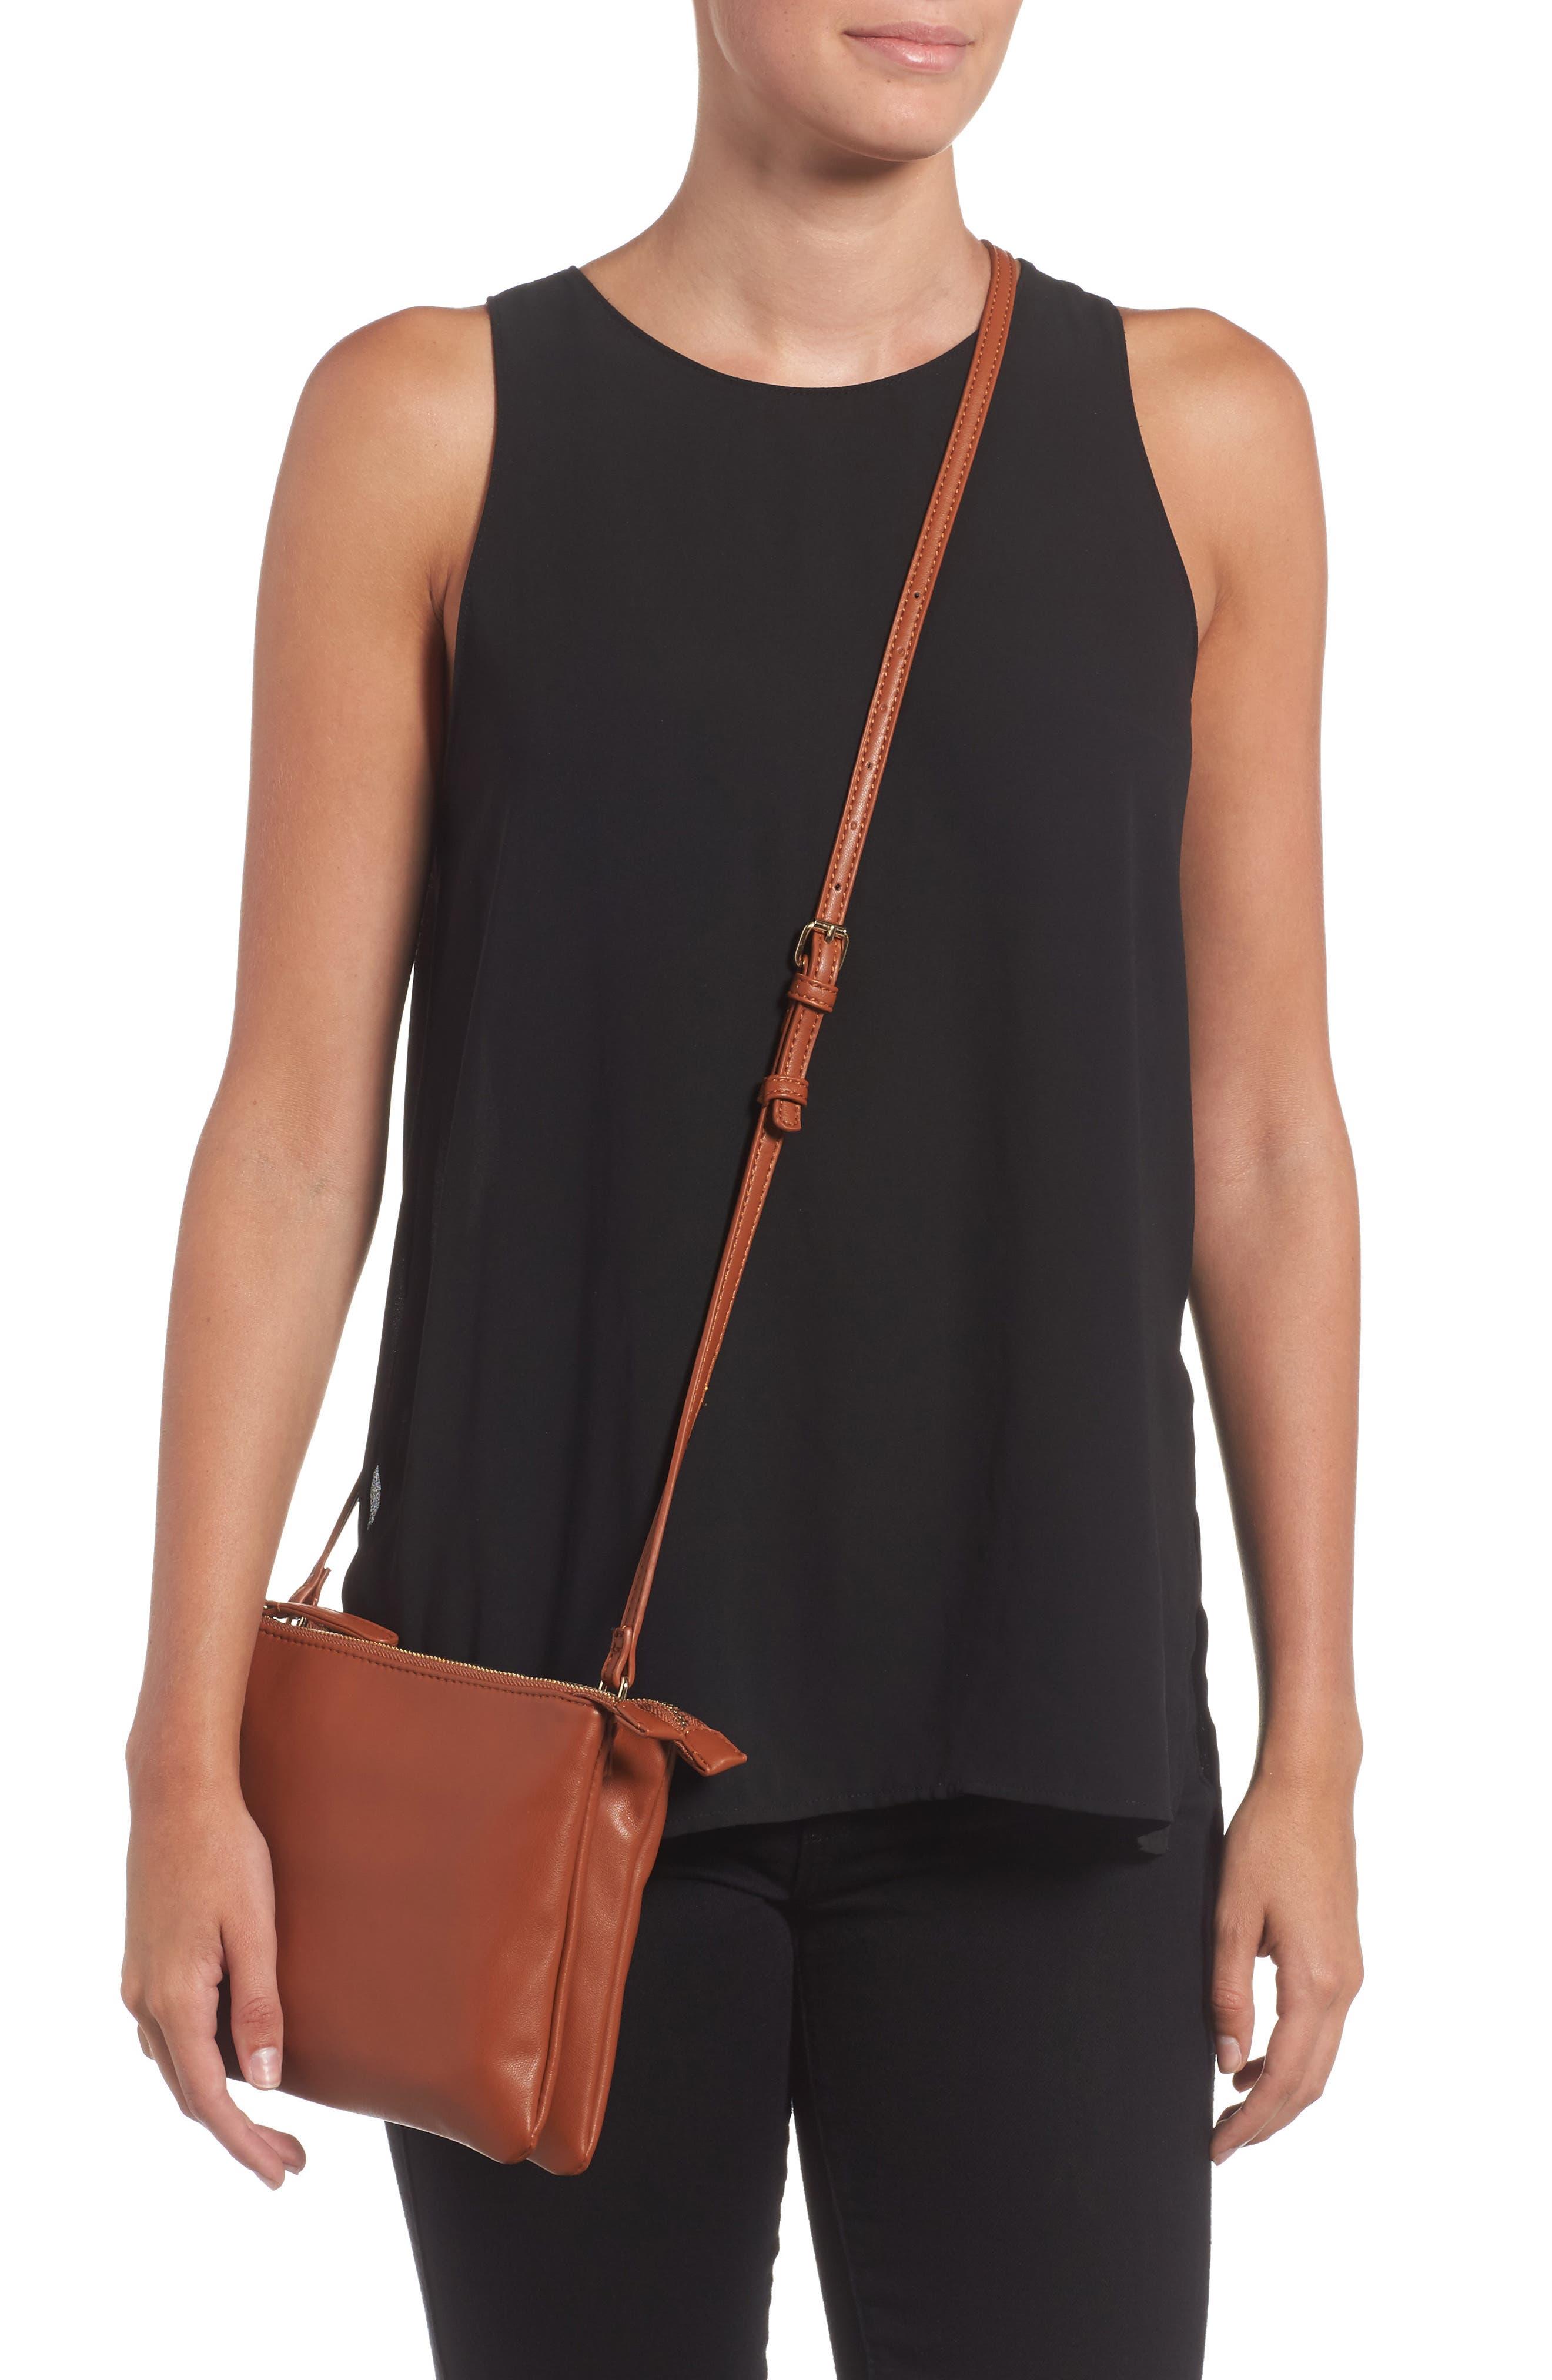 Madden Faux Leather Pouch Crossbody Bag,                             Alternate thumbnail 6, color,                             Cognac